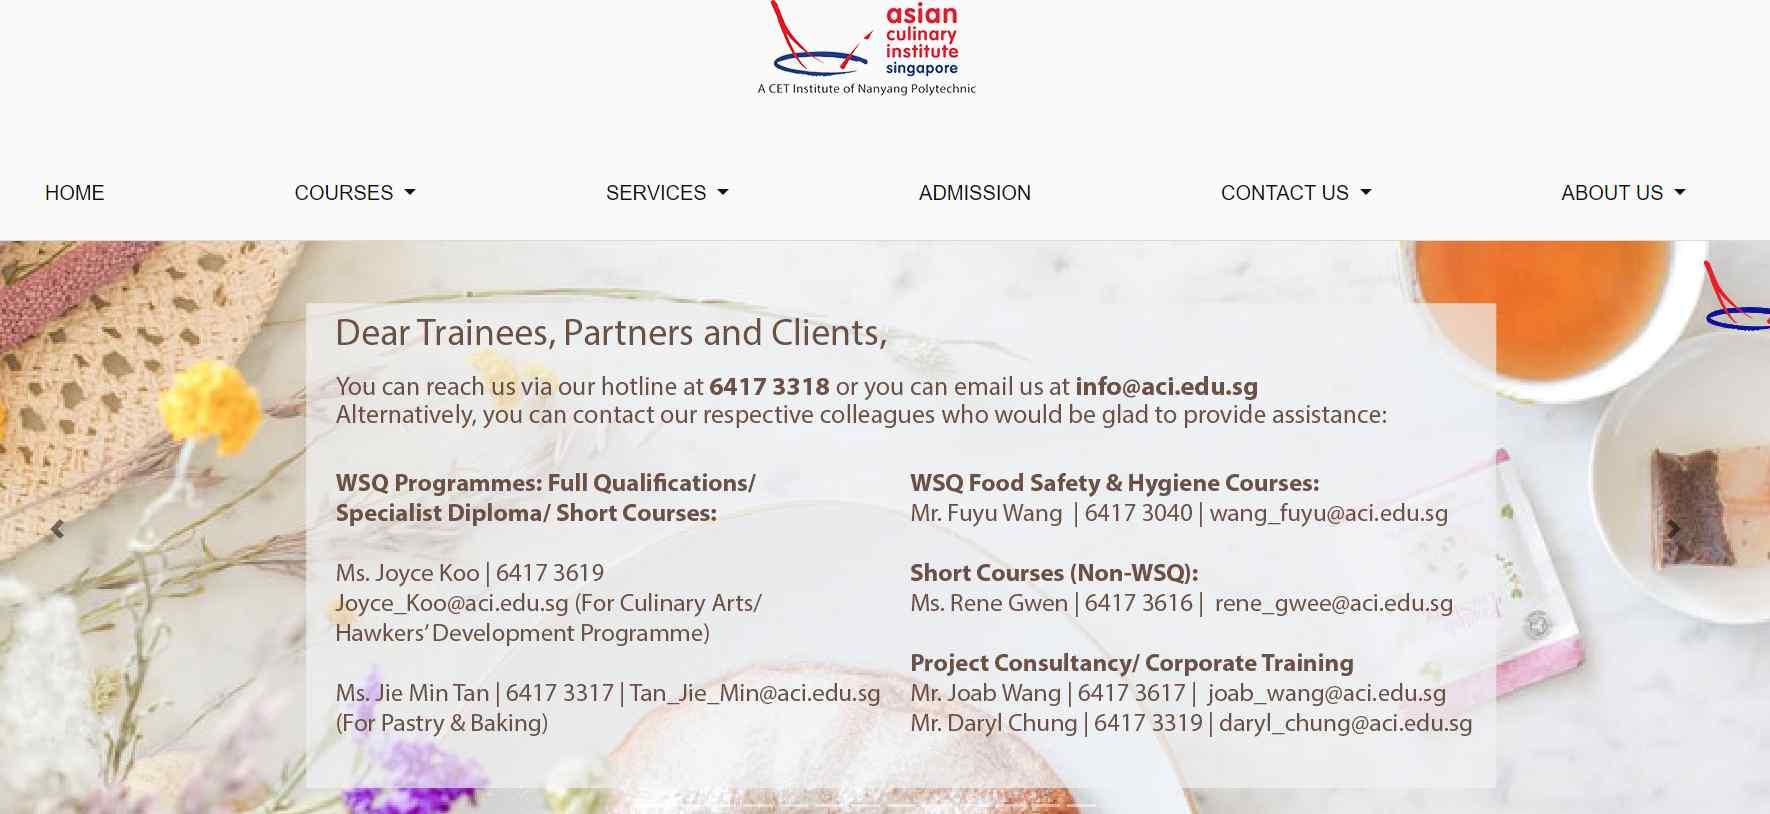 asian culinary institute Top Culinary Schools in Singapore